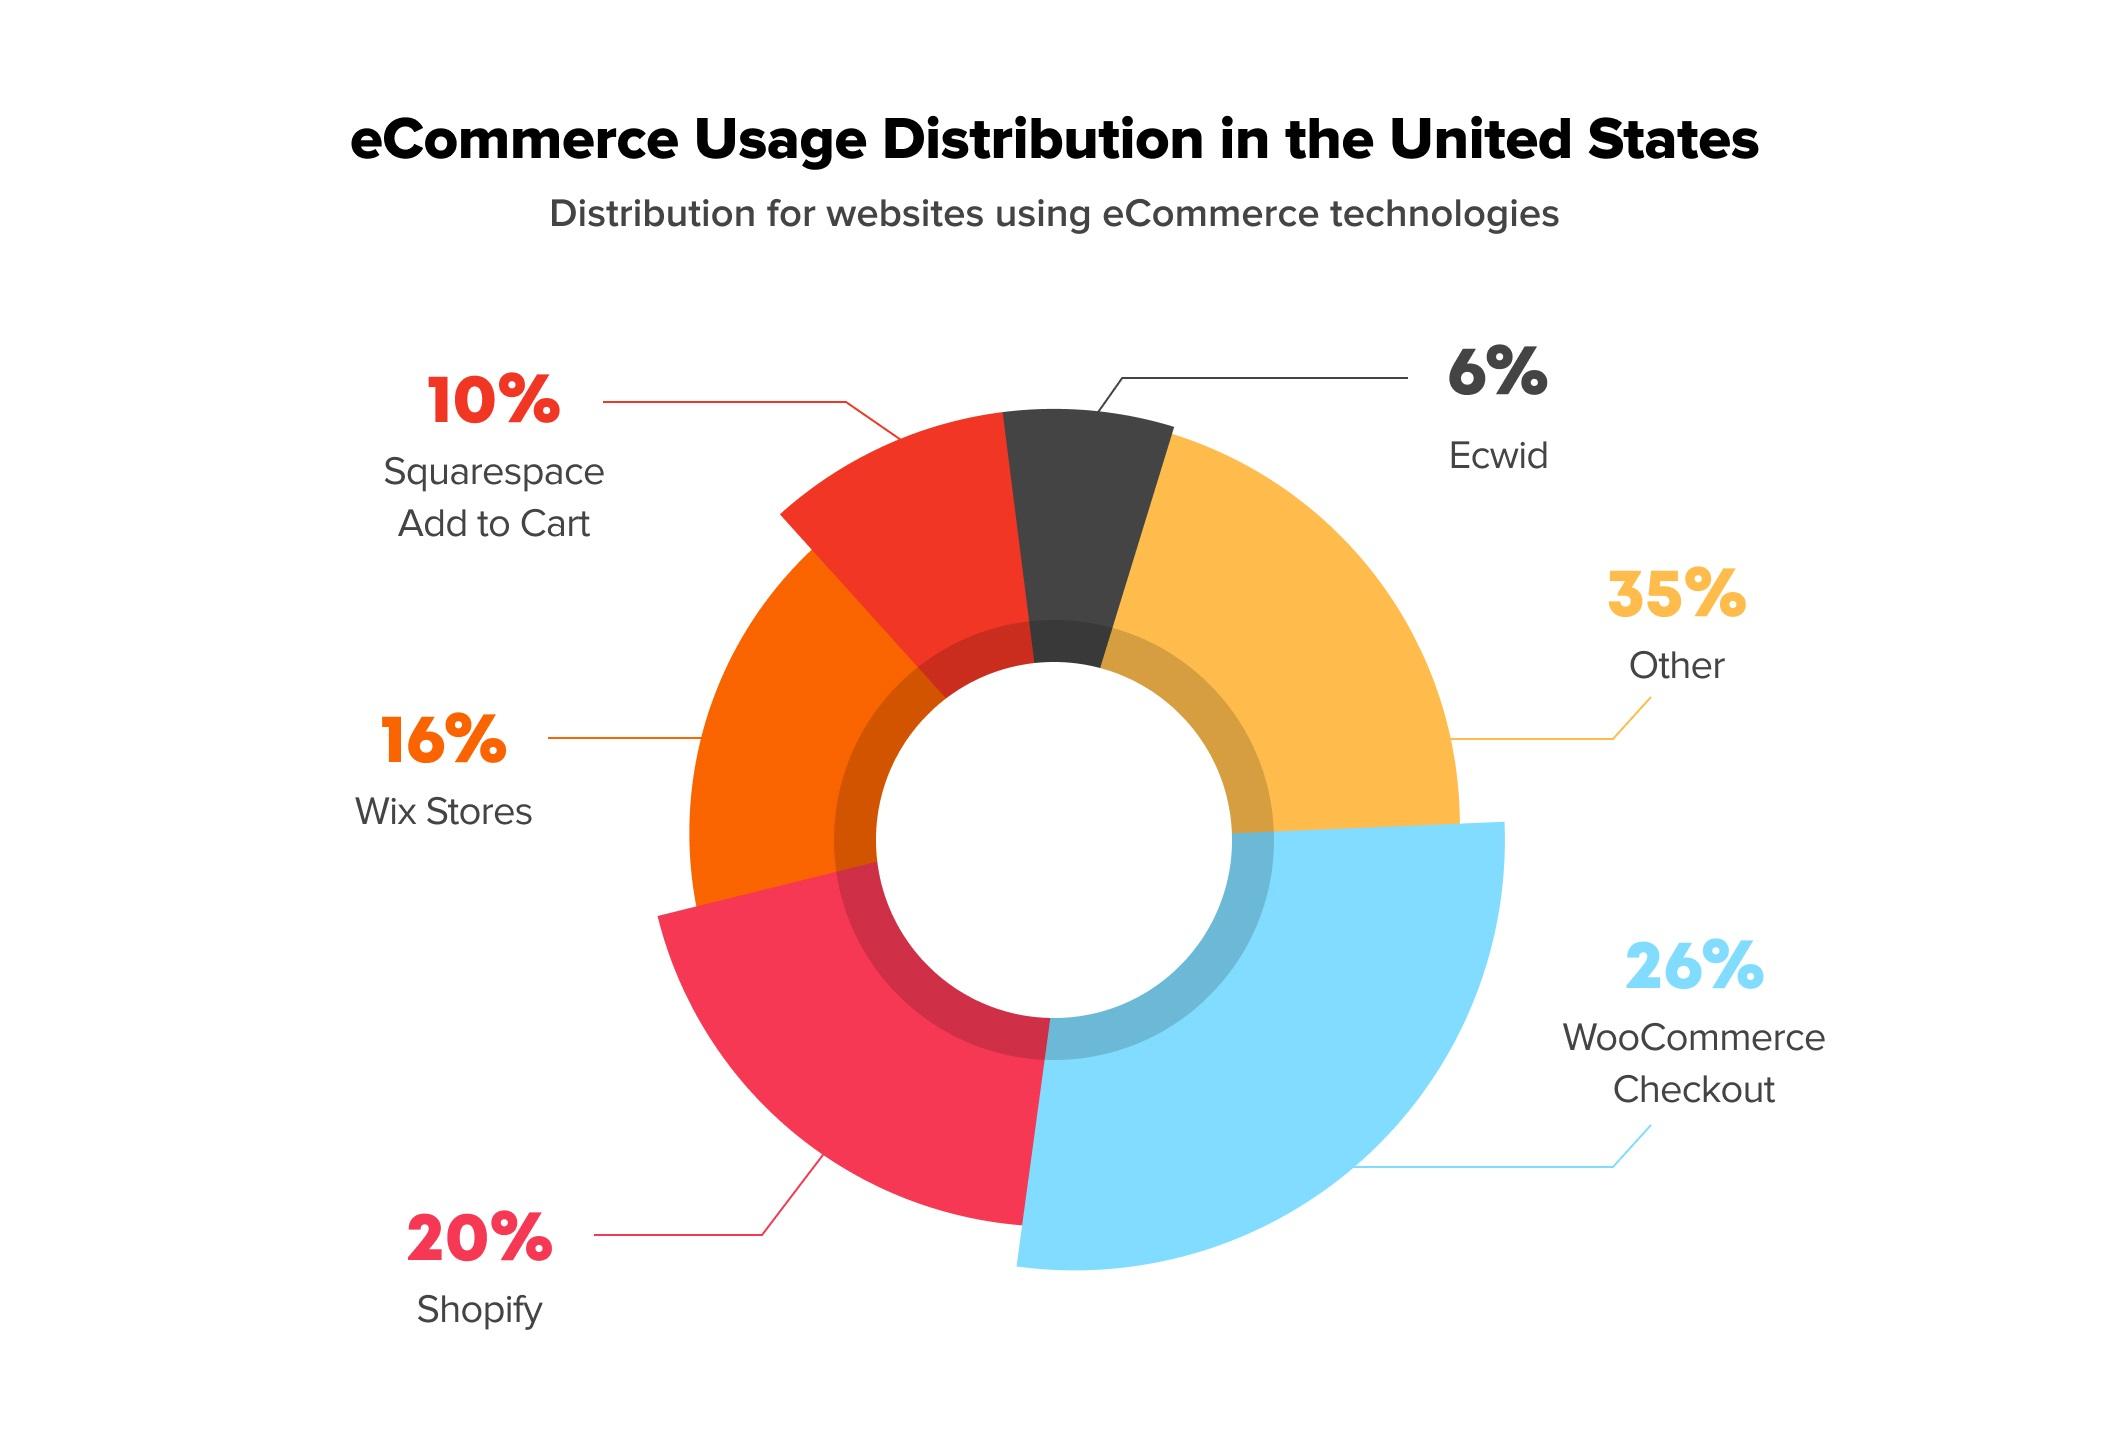 eCommerce Usage Distribution